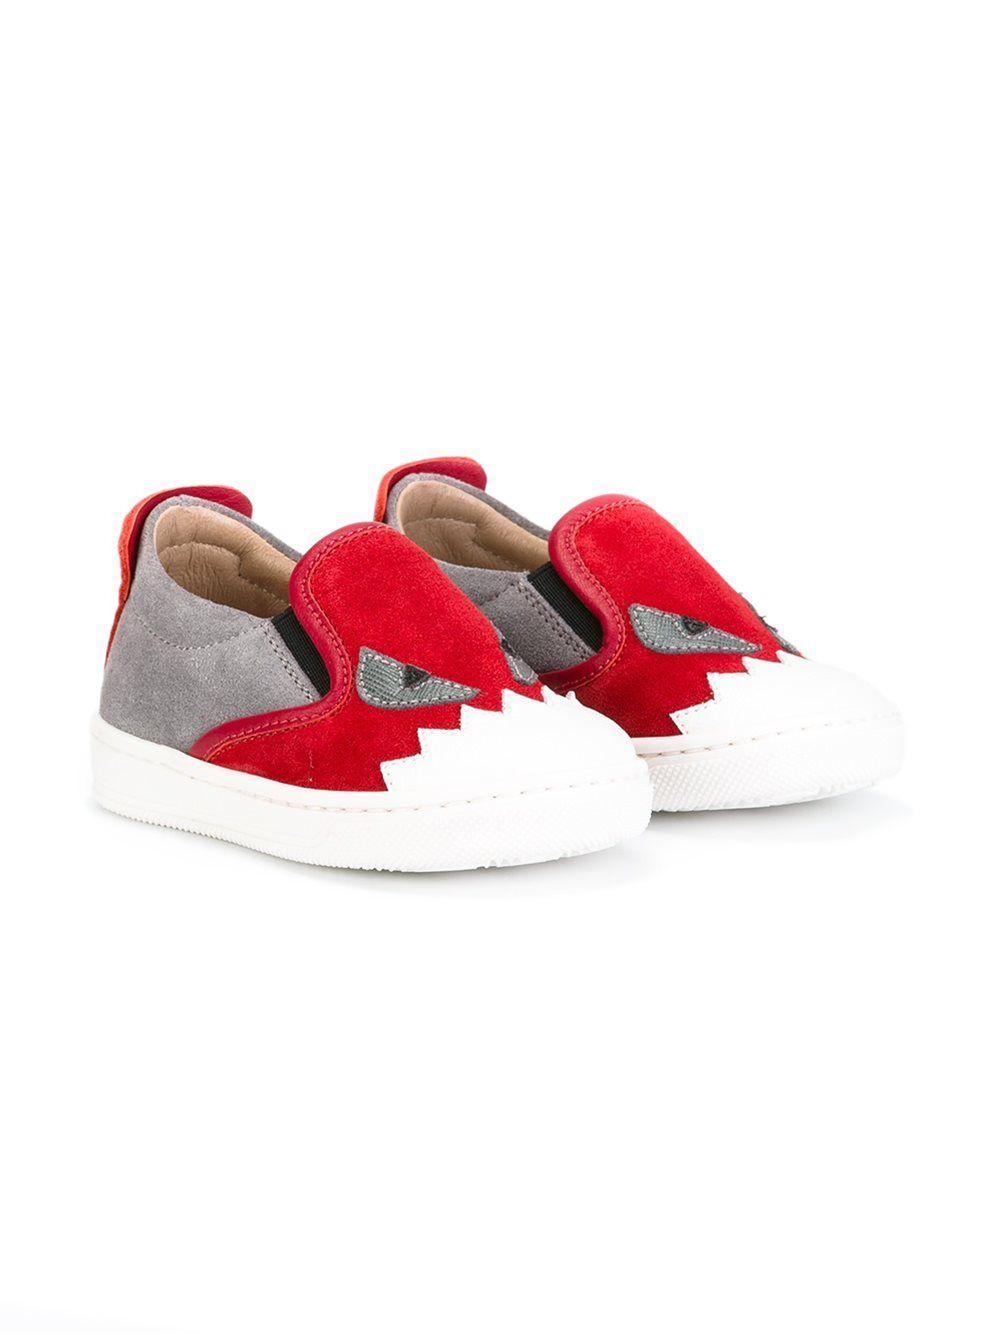 fendi  bagbugs  sneakers  red  slipon  kids  shoes  new www.jofre.eu ... f43783db866